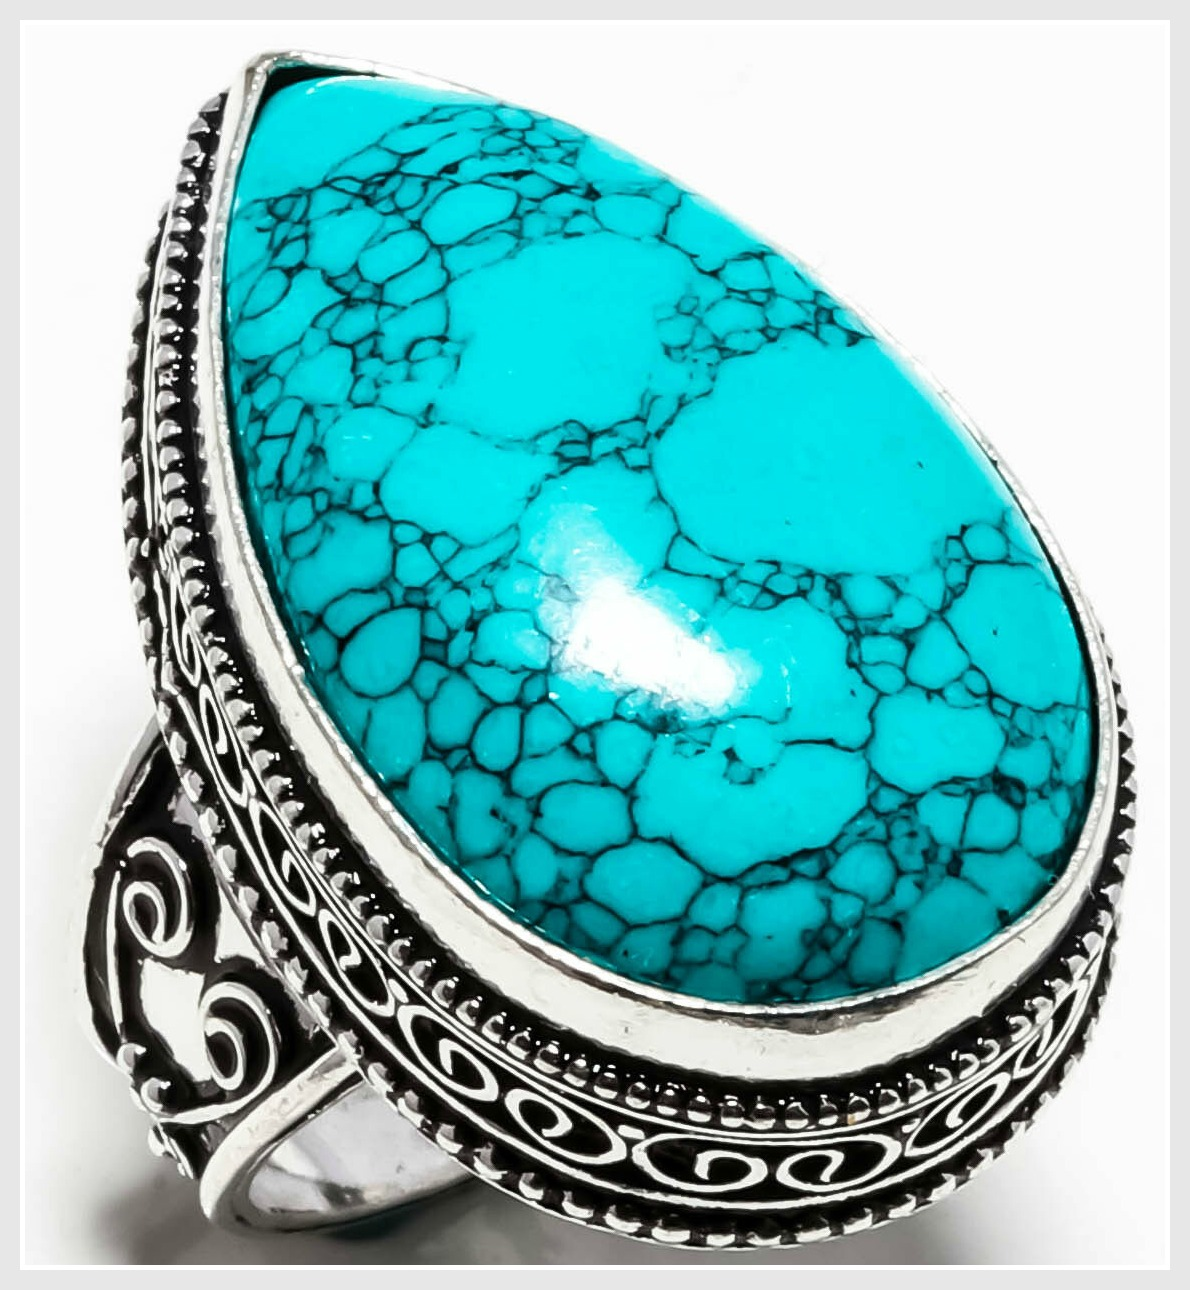 SANTA ROSA RING Santa Rosa Turquoise Gemstone Large Handmade 925 SS Ring